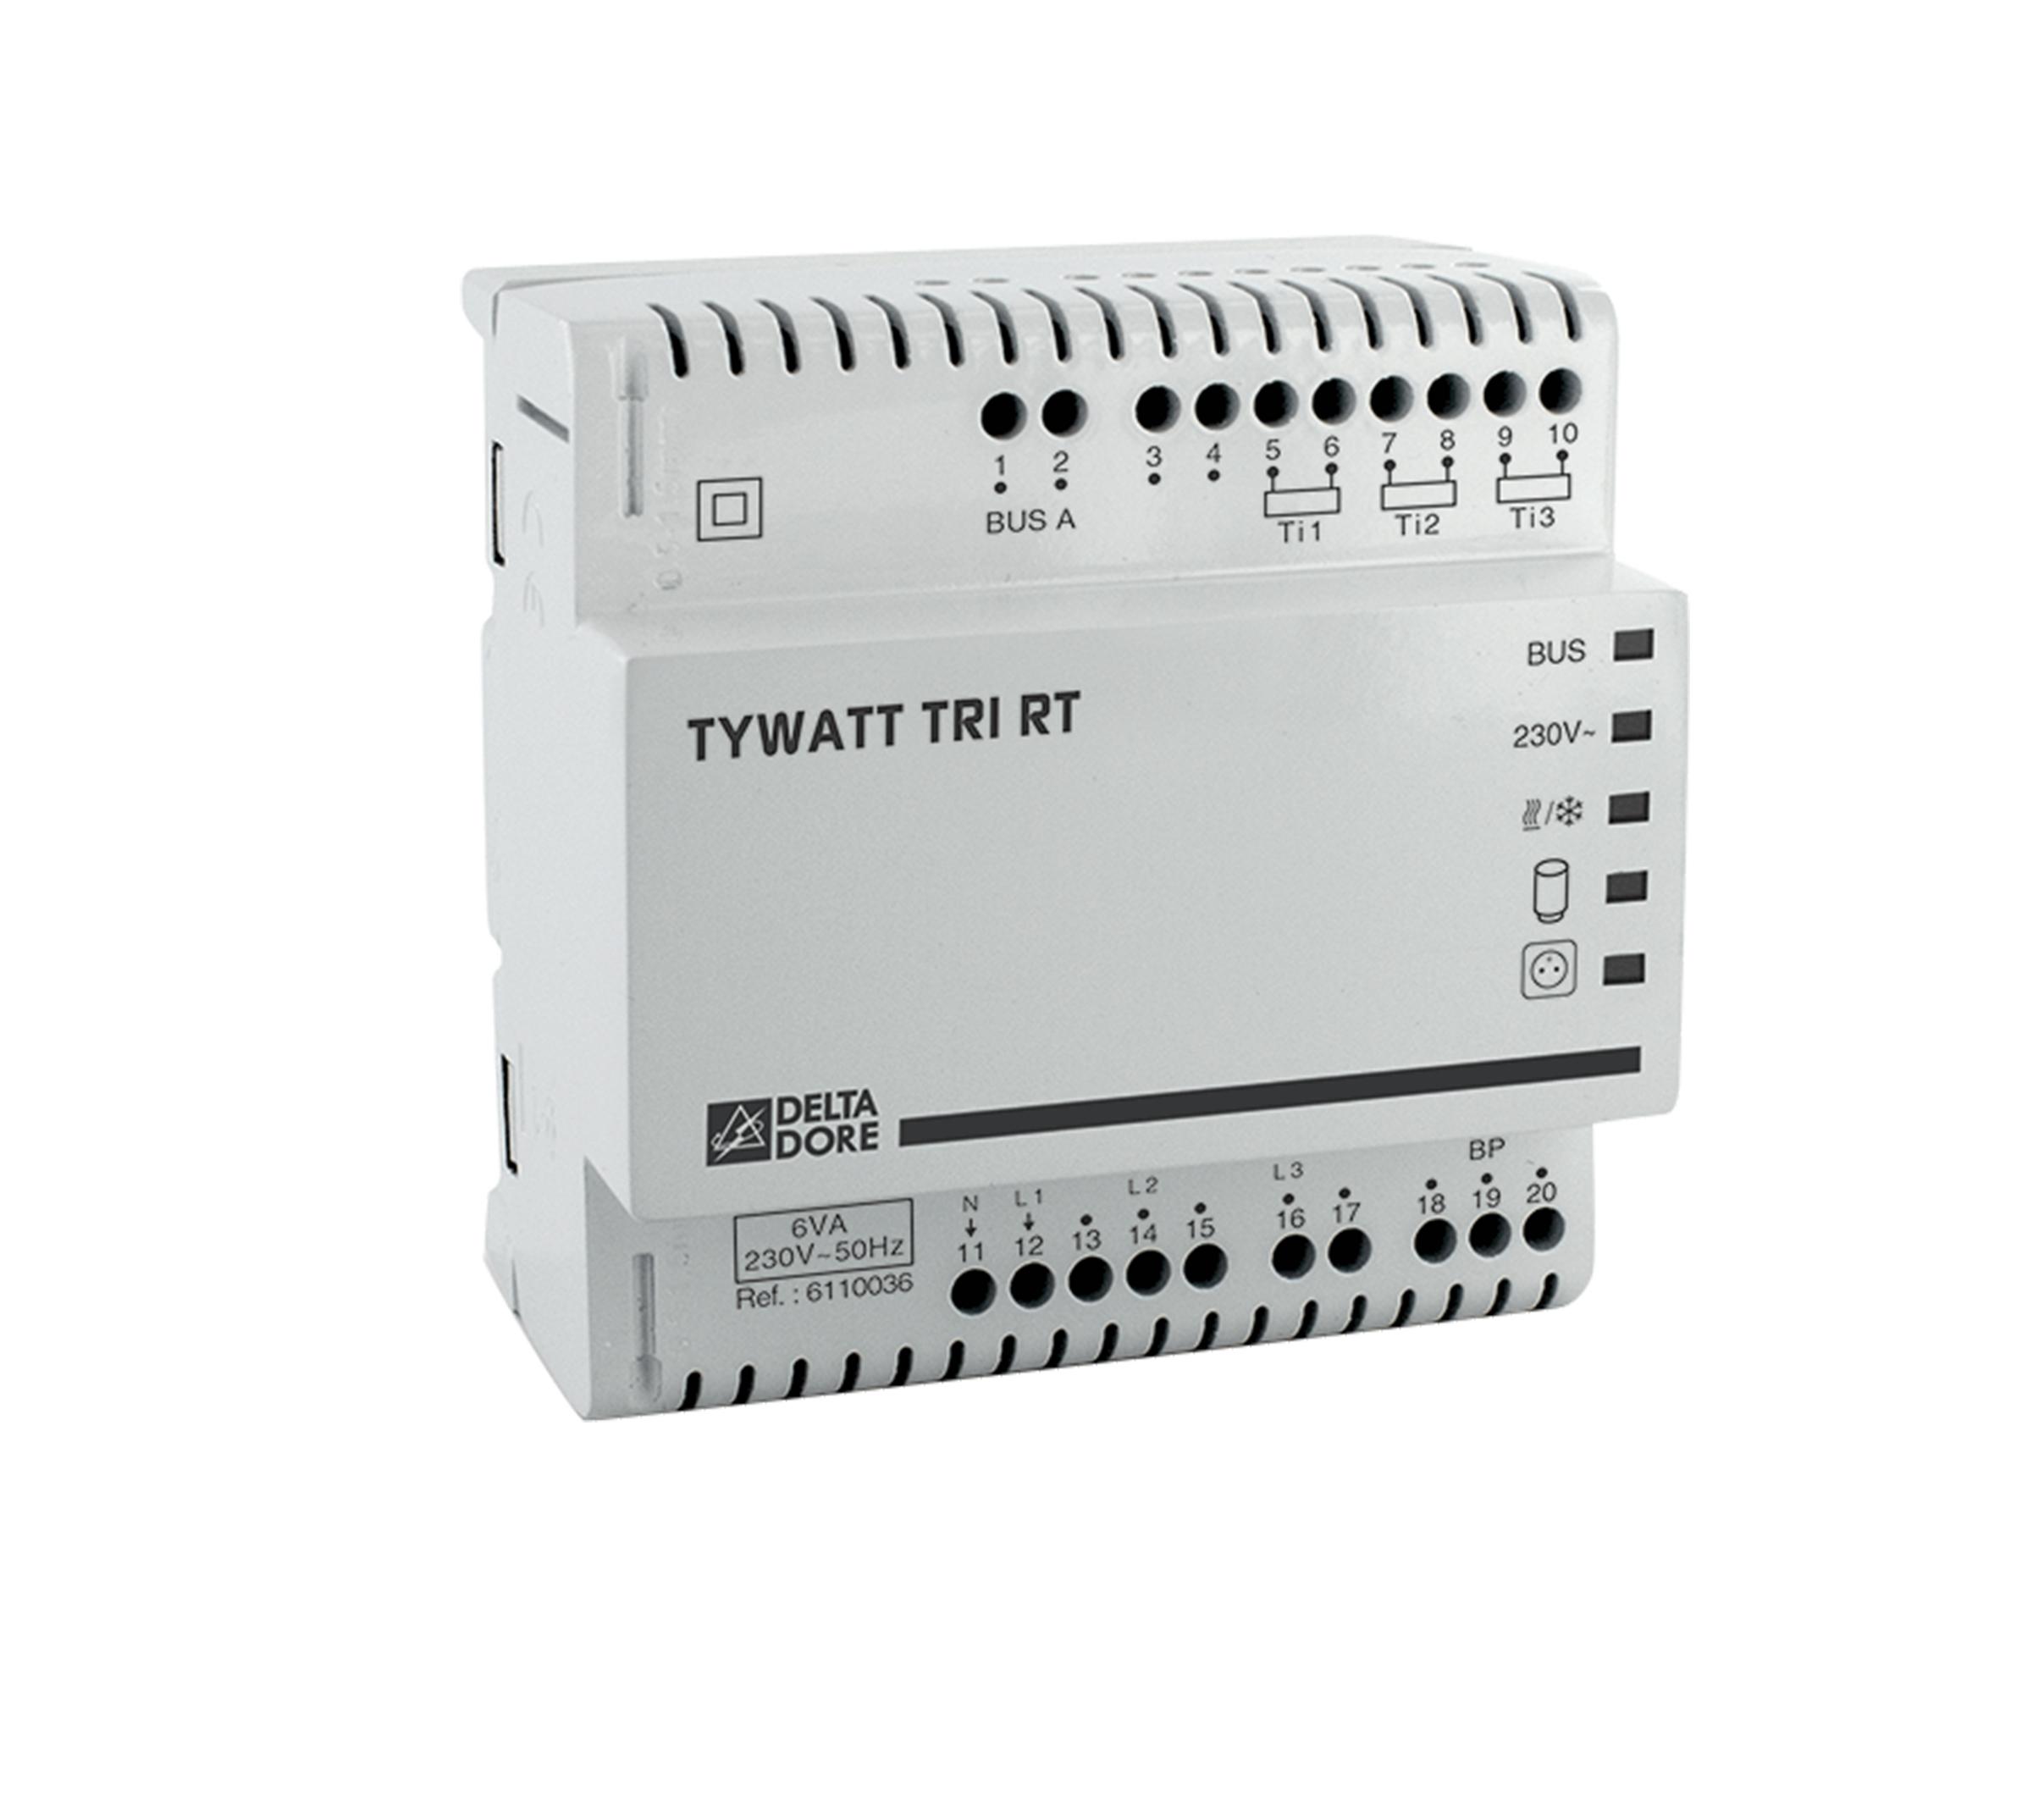 6110036_TYWATT-TRI-RT_pers_HD-rev01